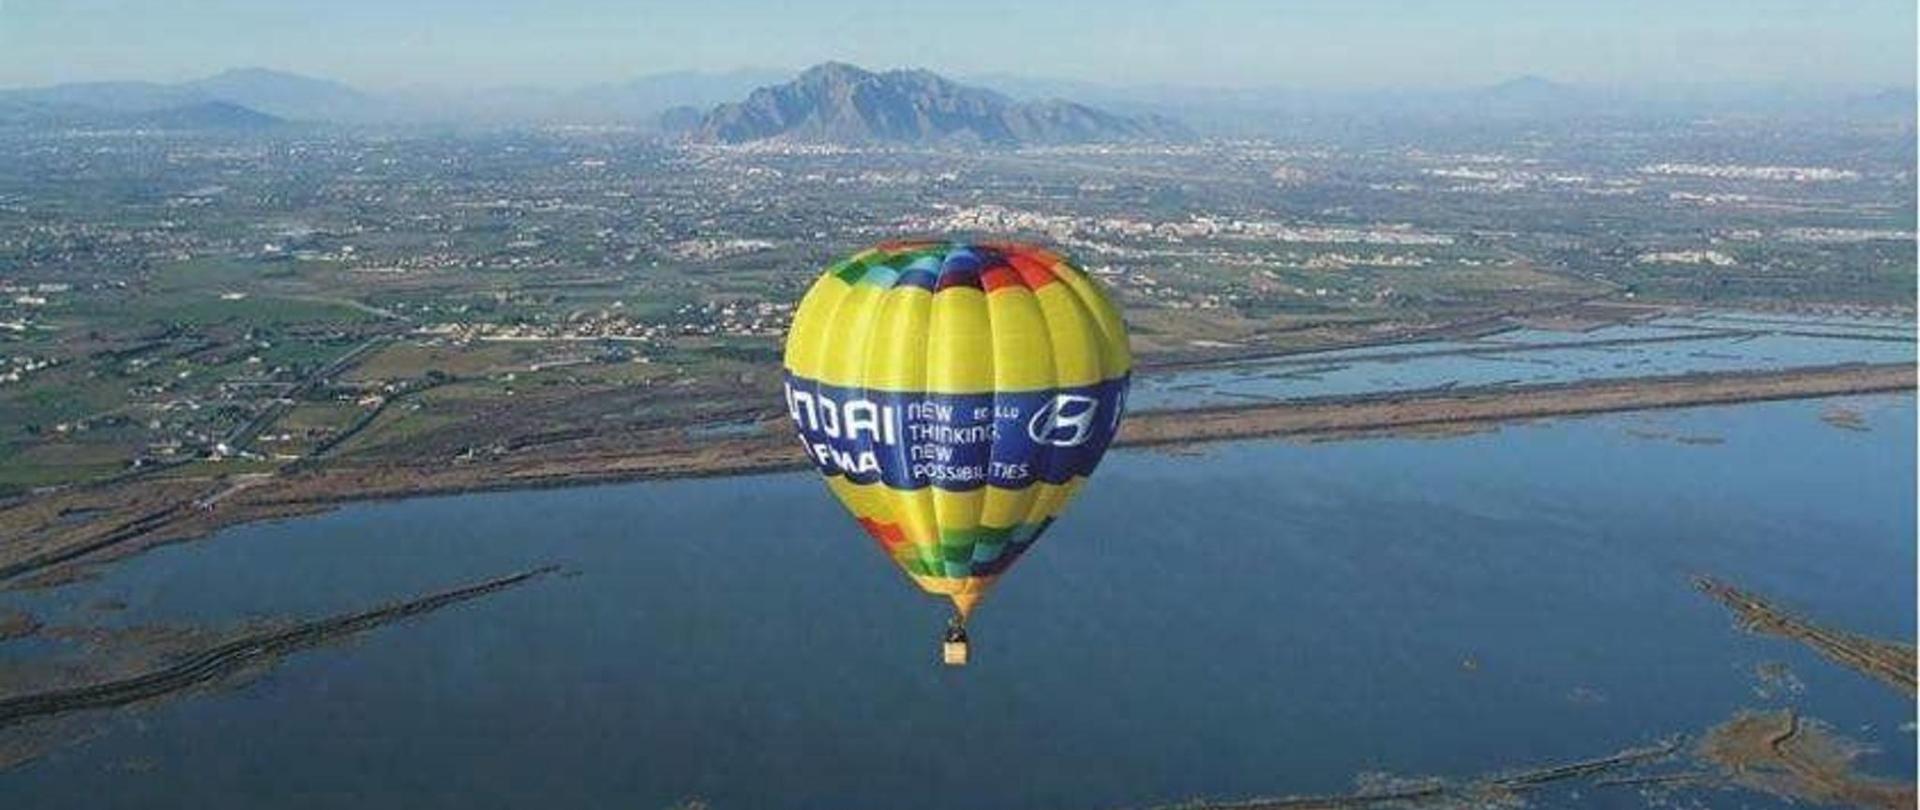 vuelo-en-globo-mcb.jpg